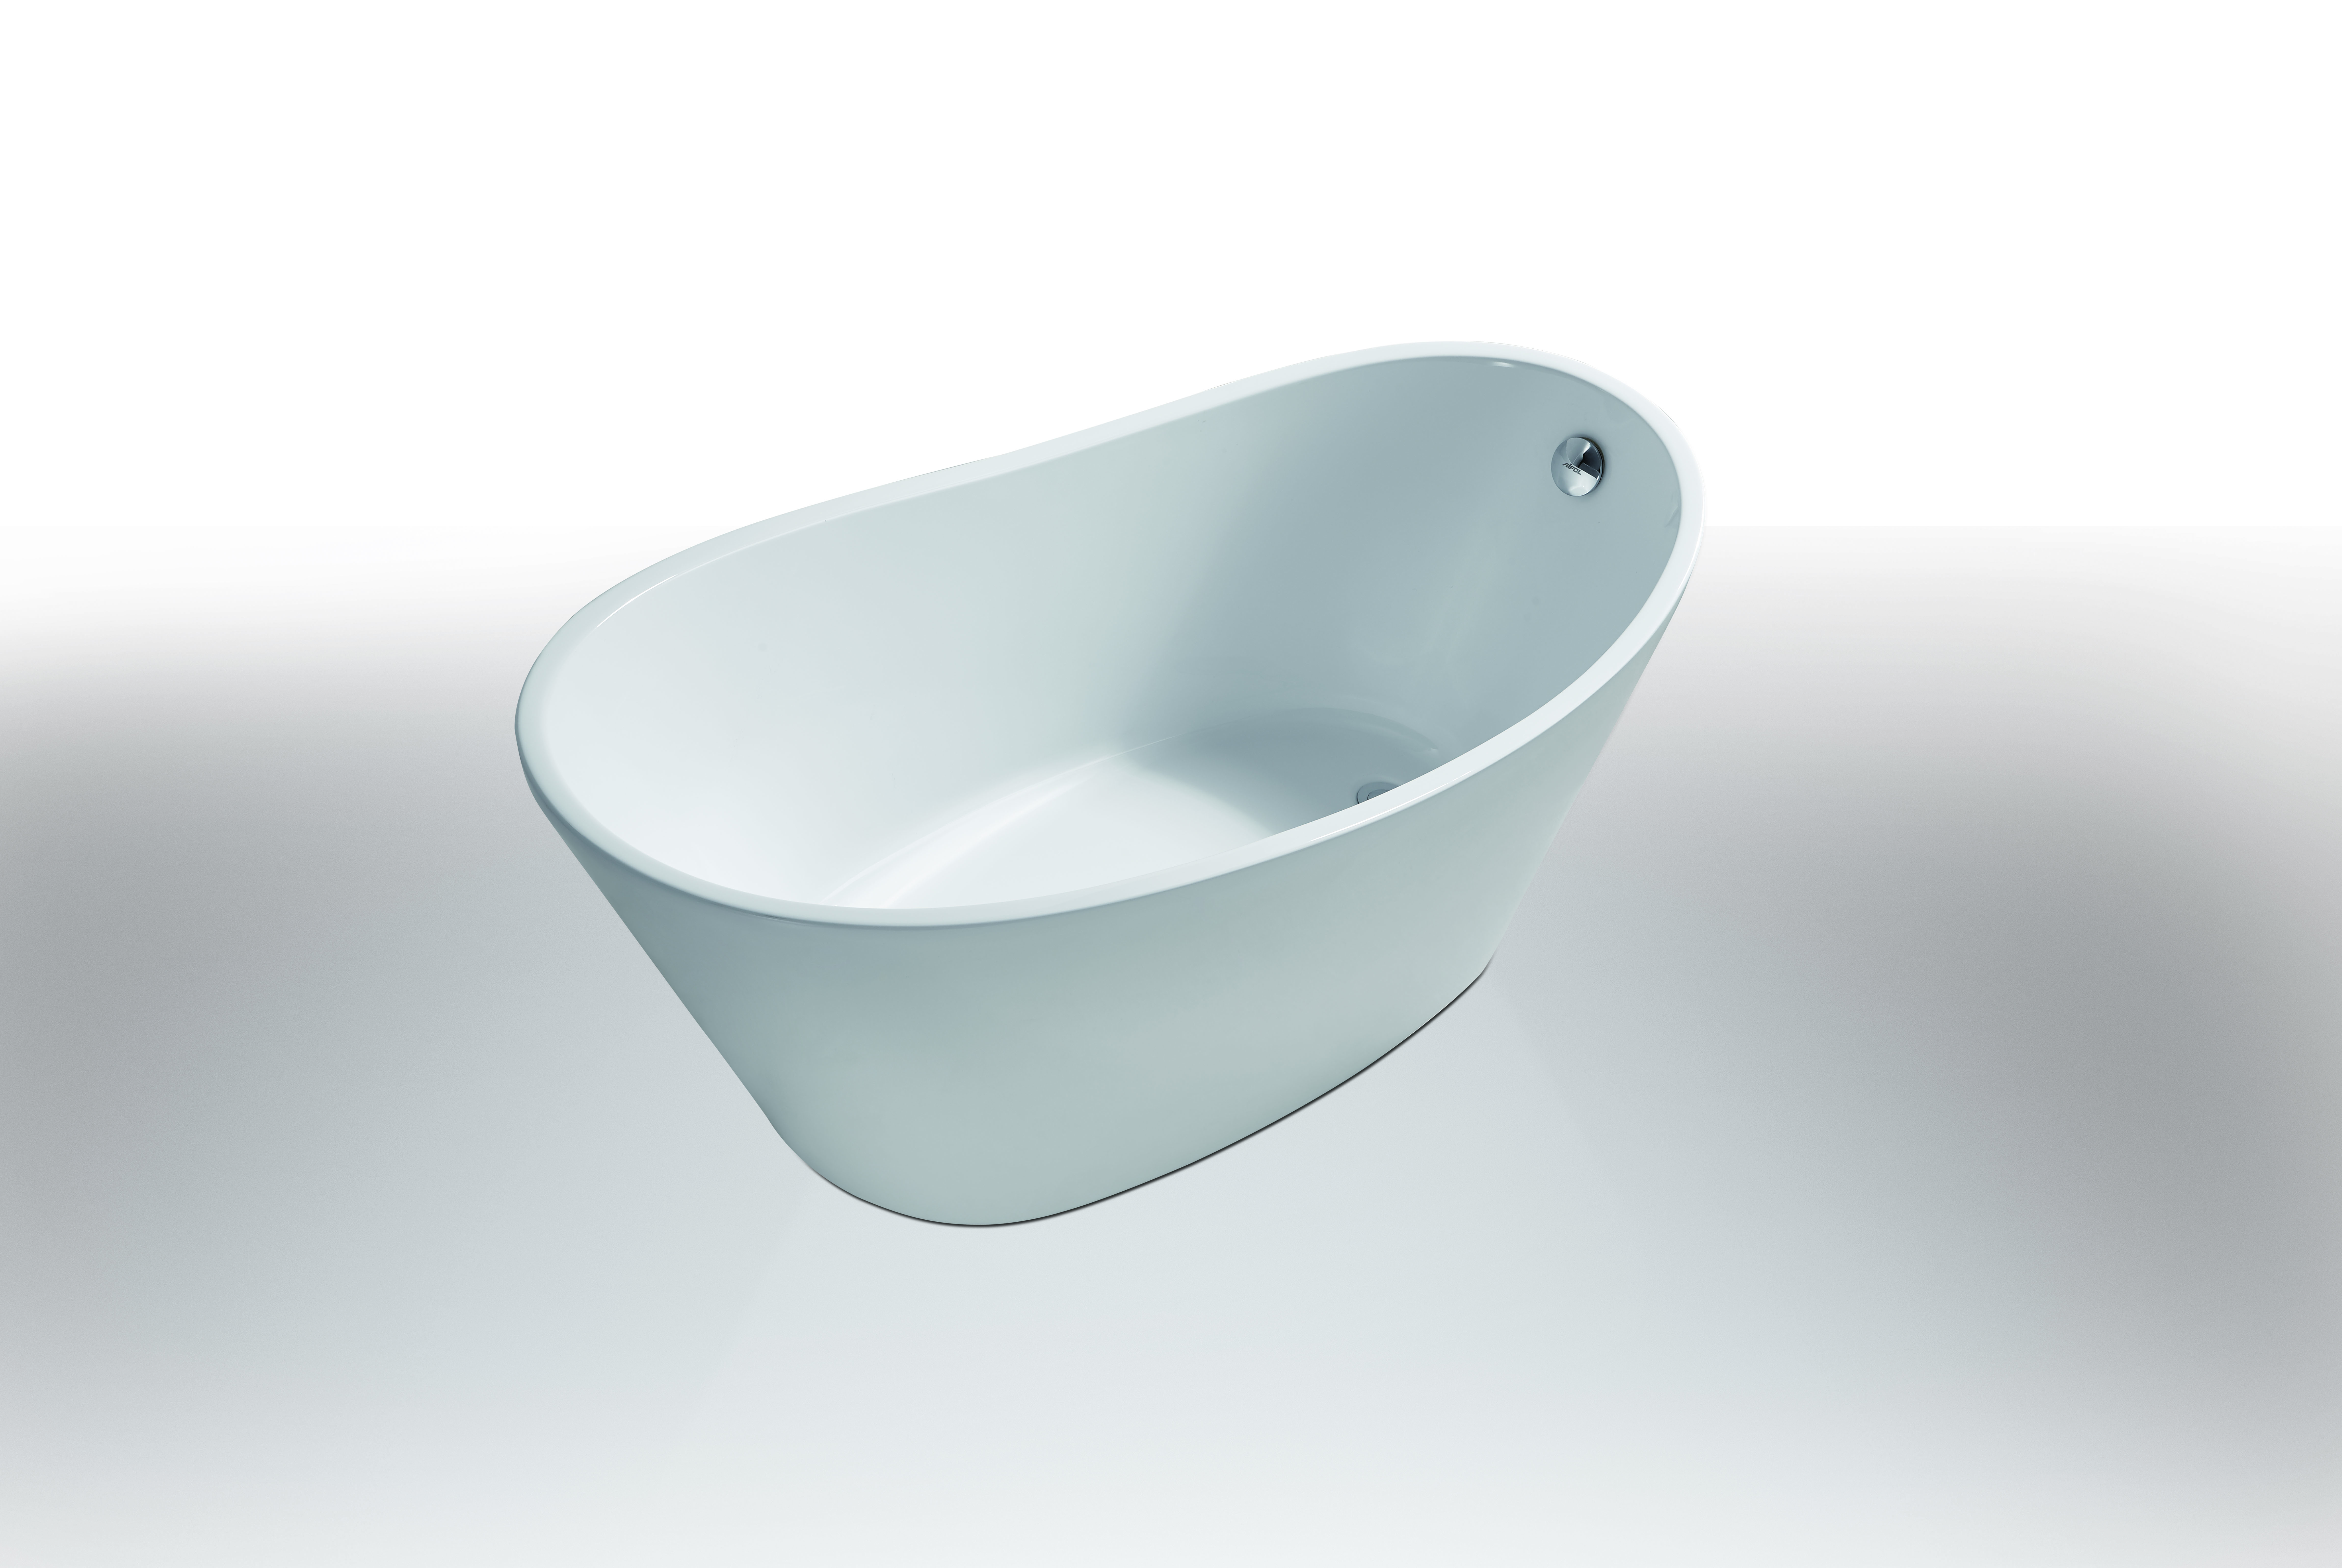 Lavello bad vrijstaand in 150x72 of 170x78 cm